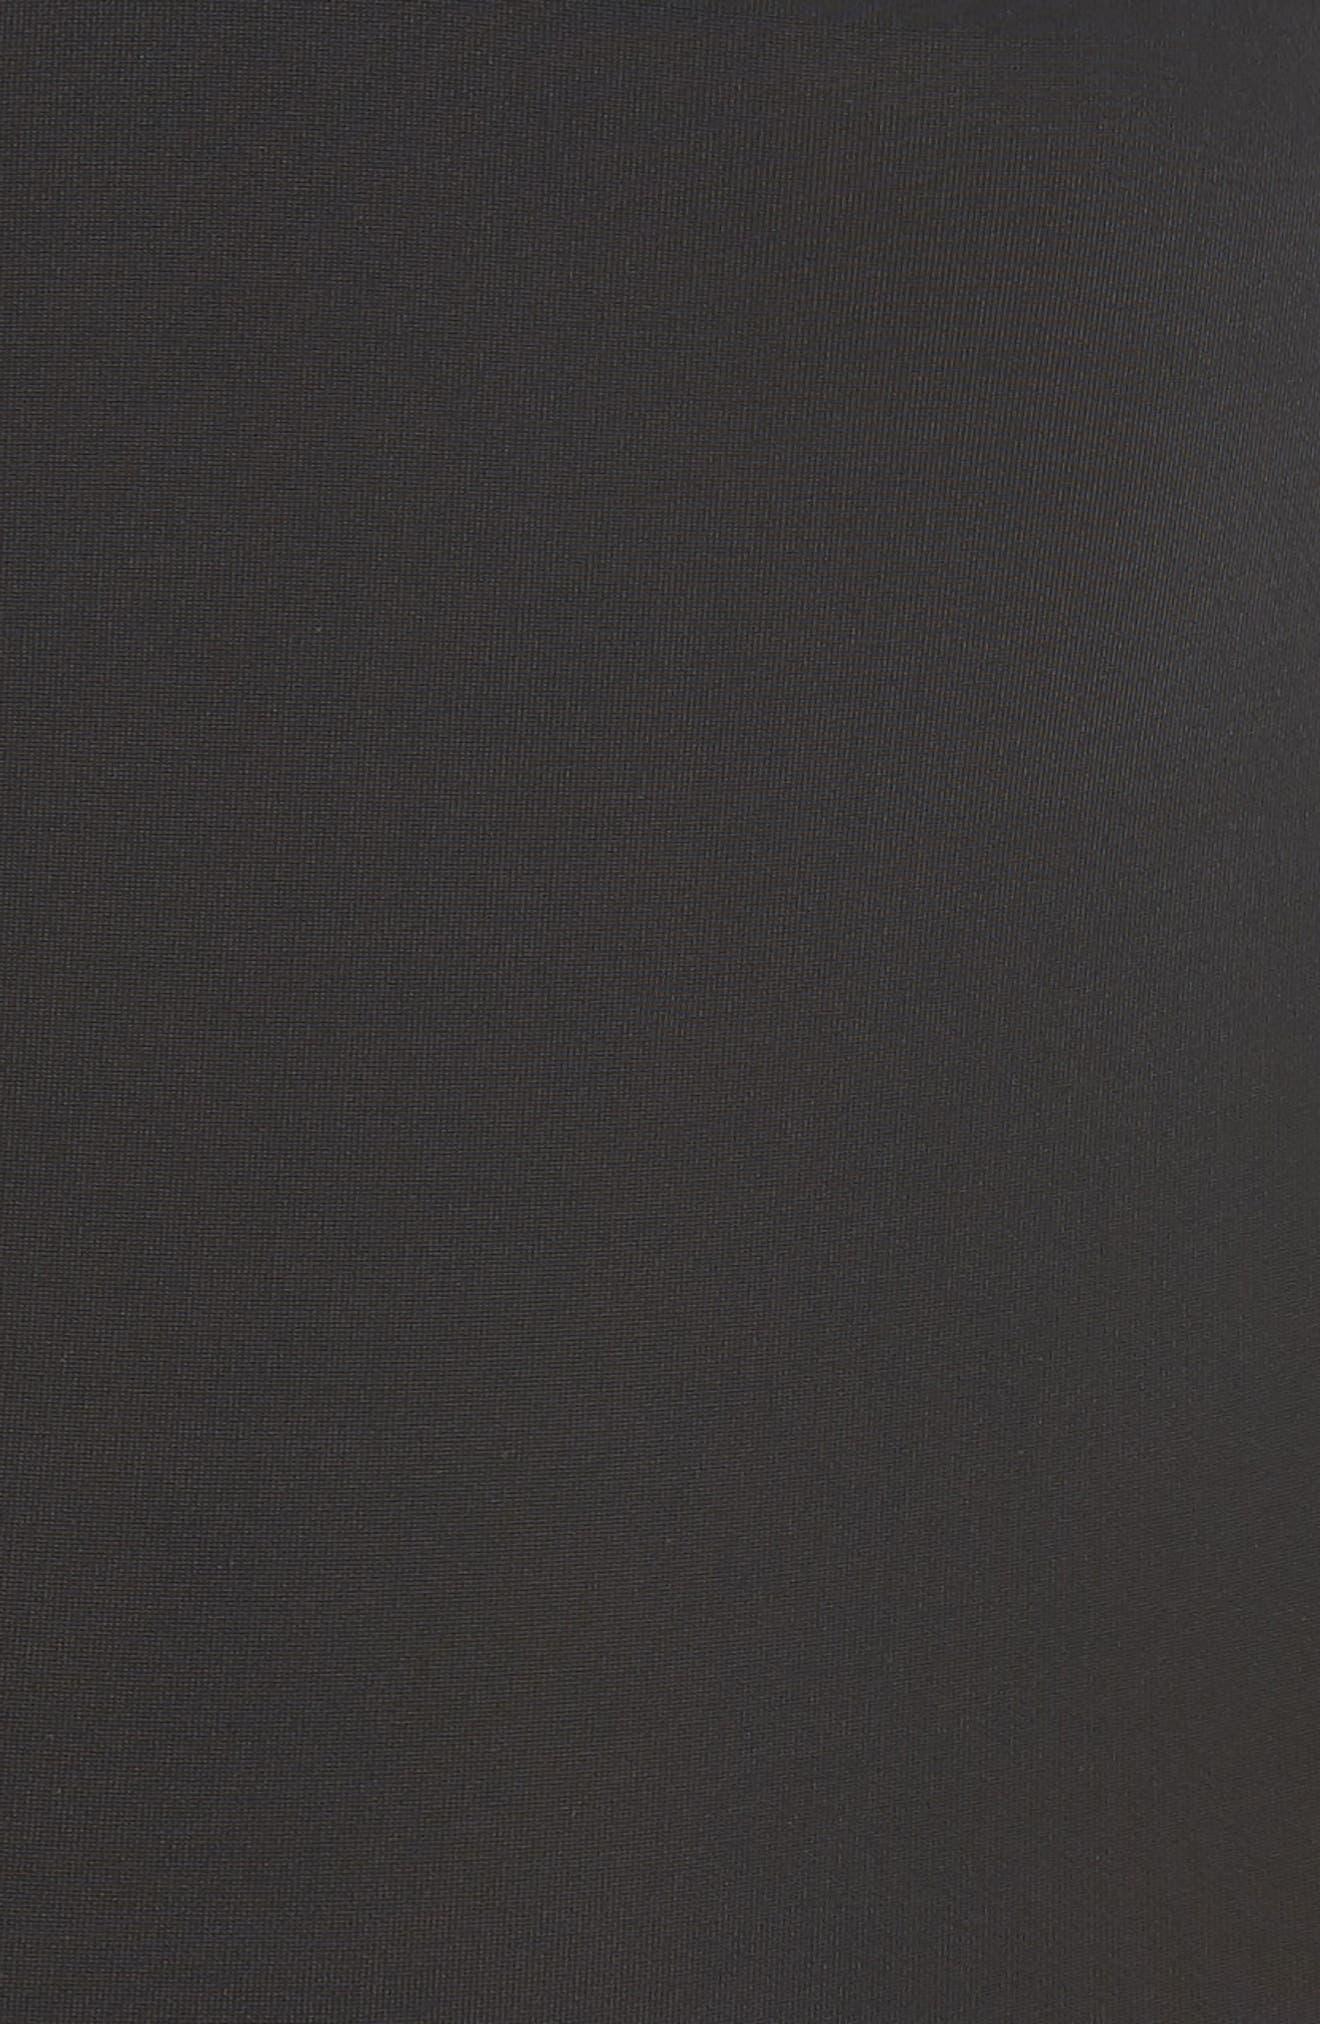 Priscilla Bodysuit,                             Alternate thumbnail 5, color,                             BLACK